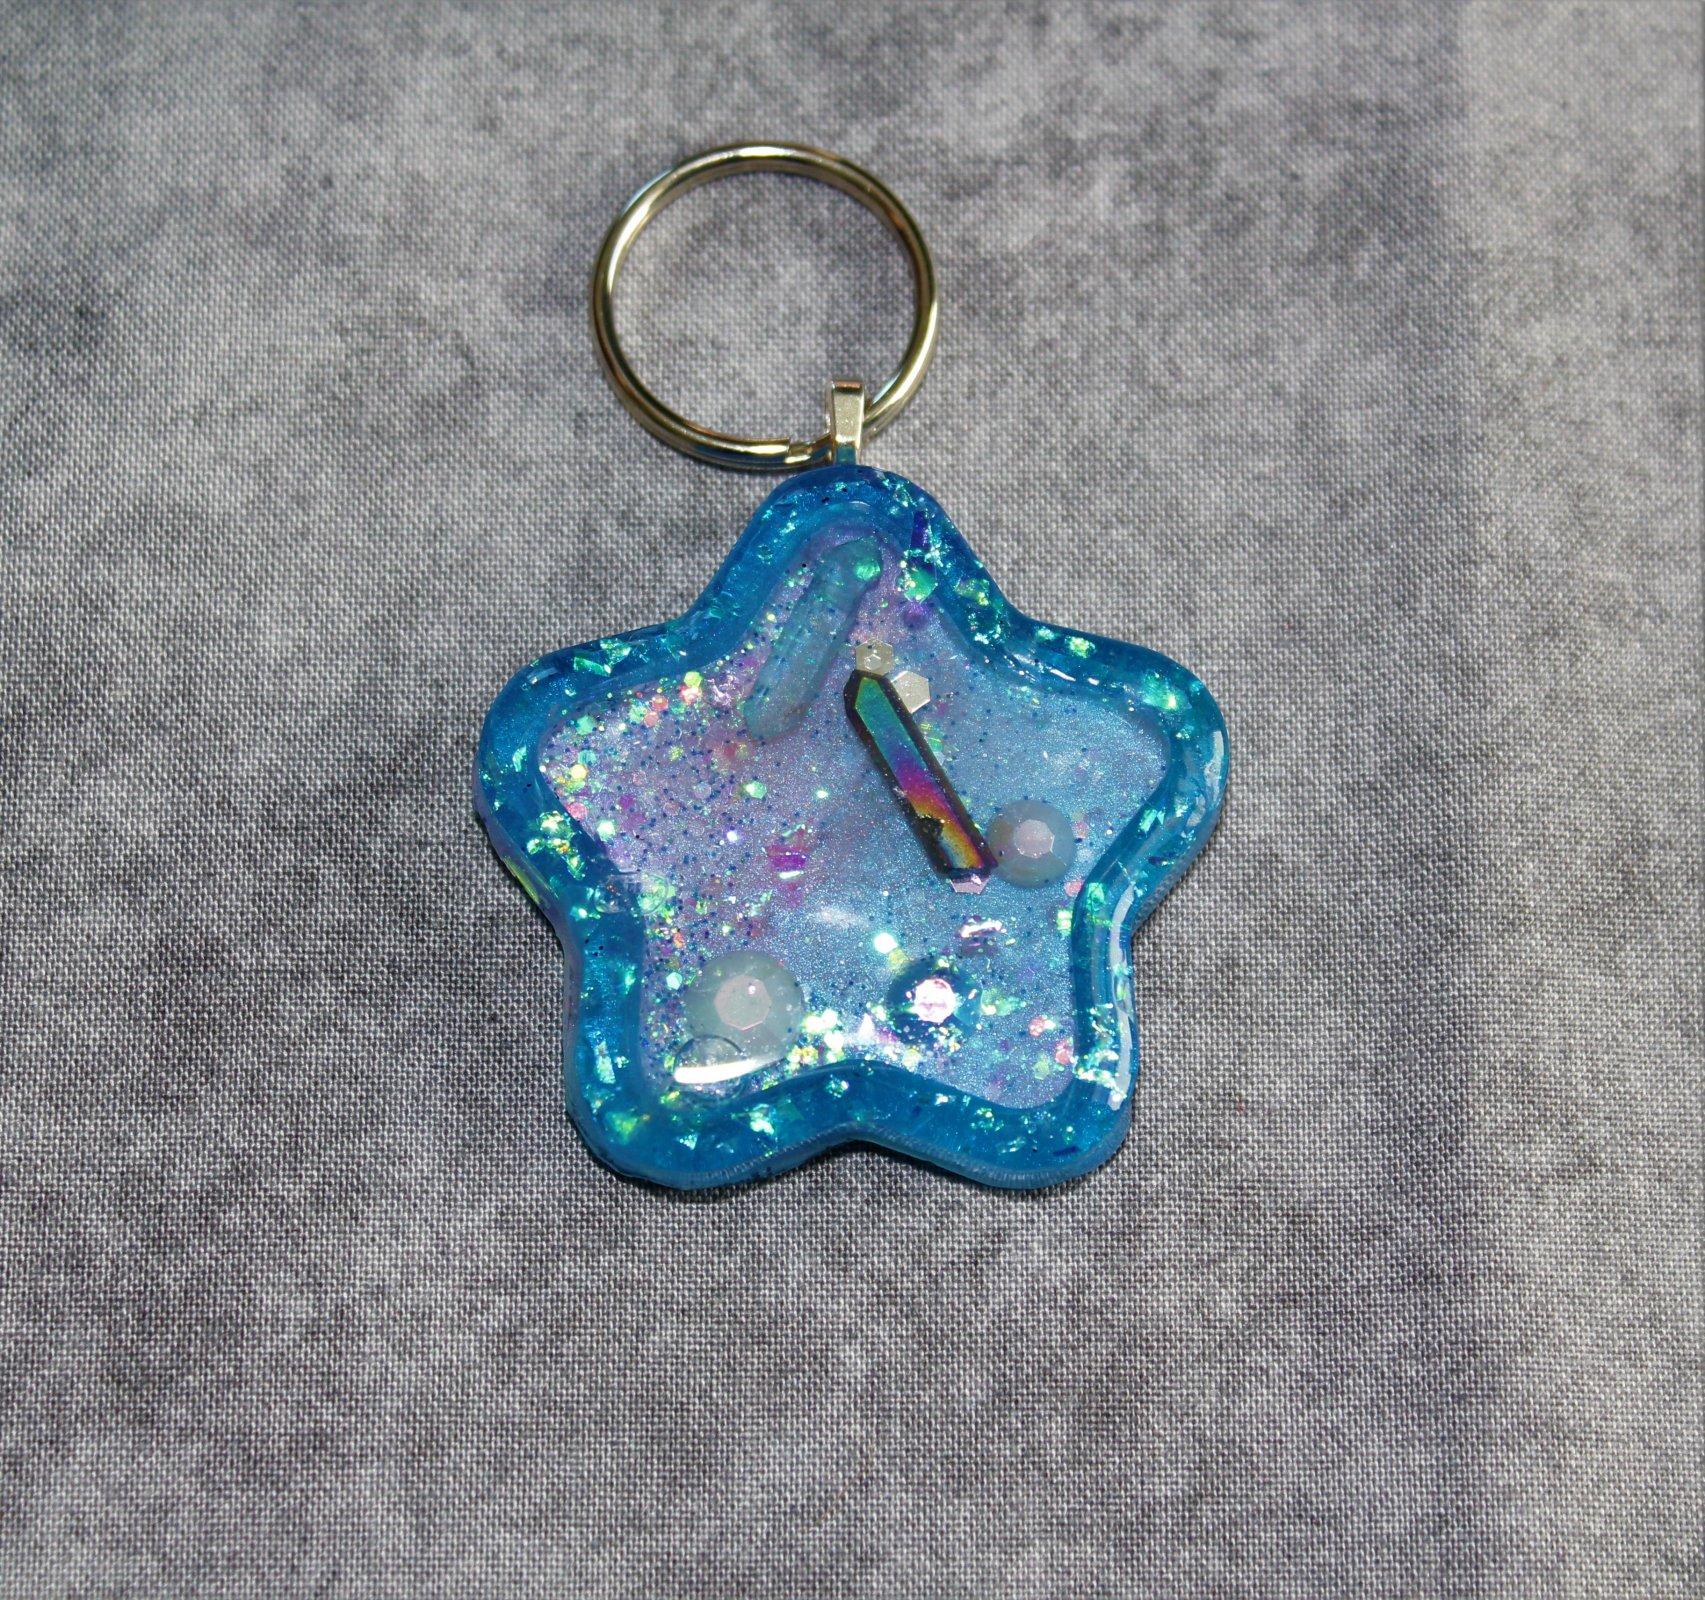 Star Shaped Resin Shaker Keychain